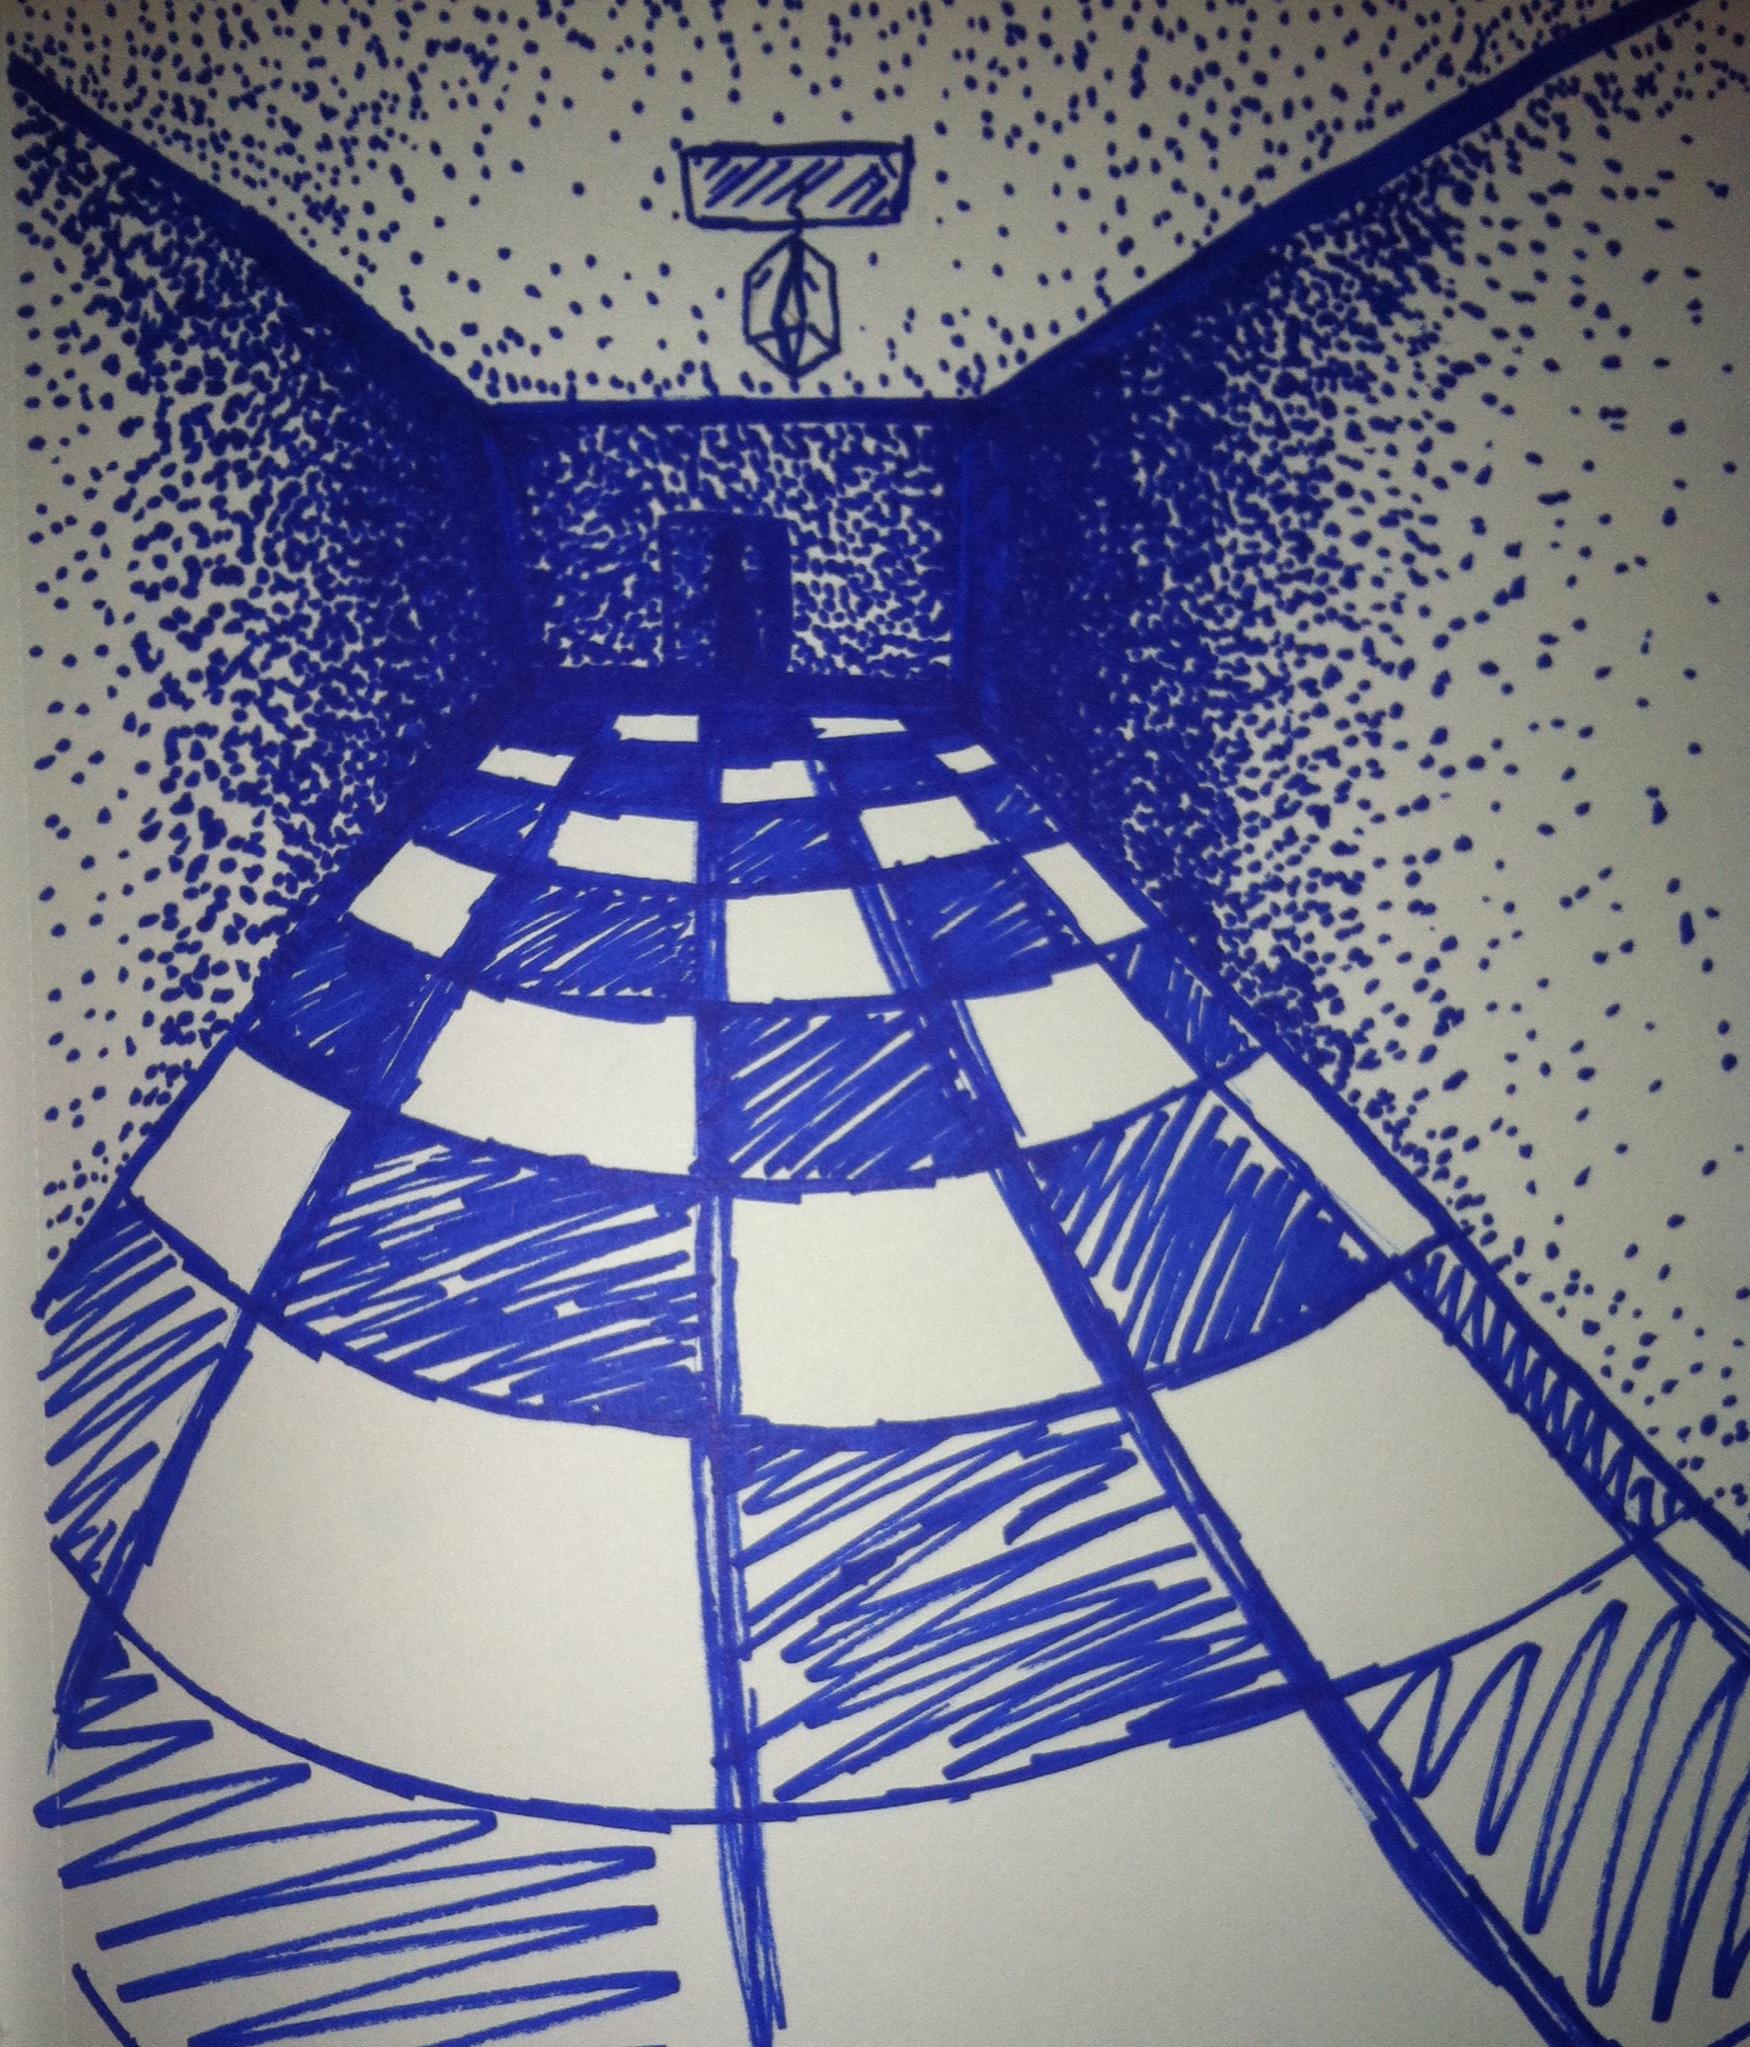 sharpie art